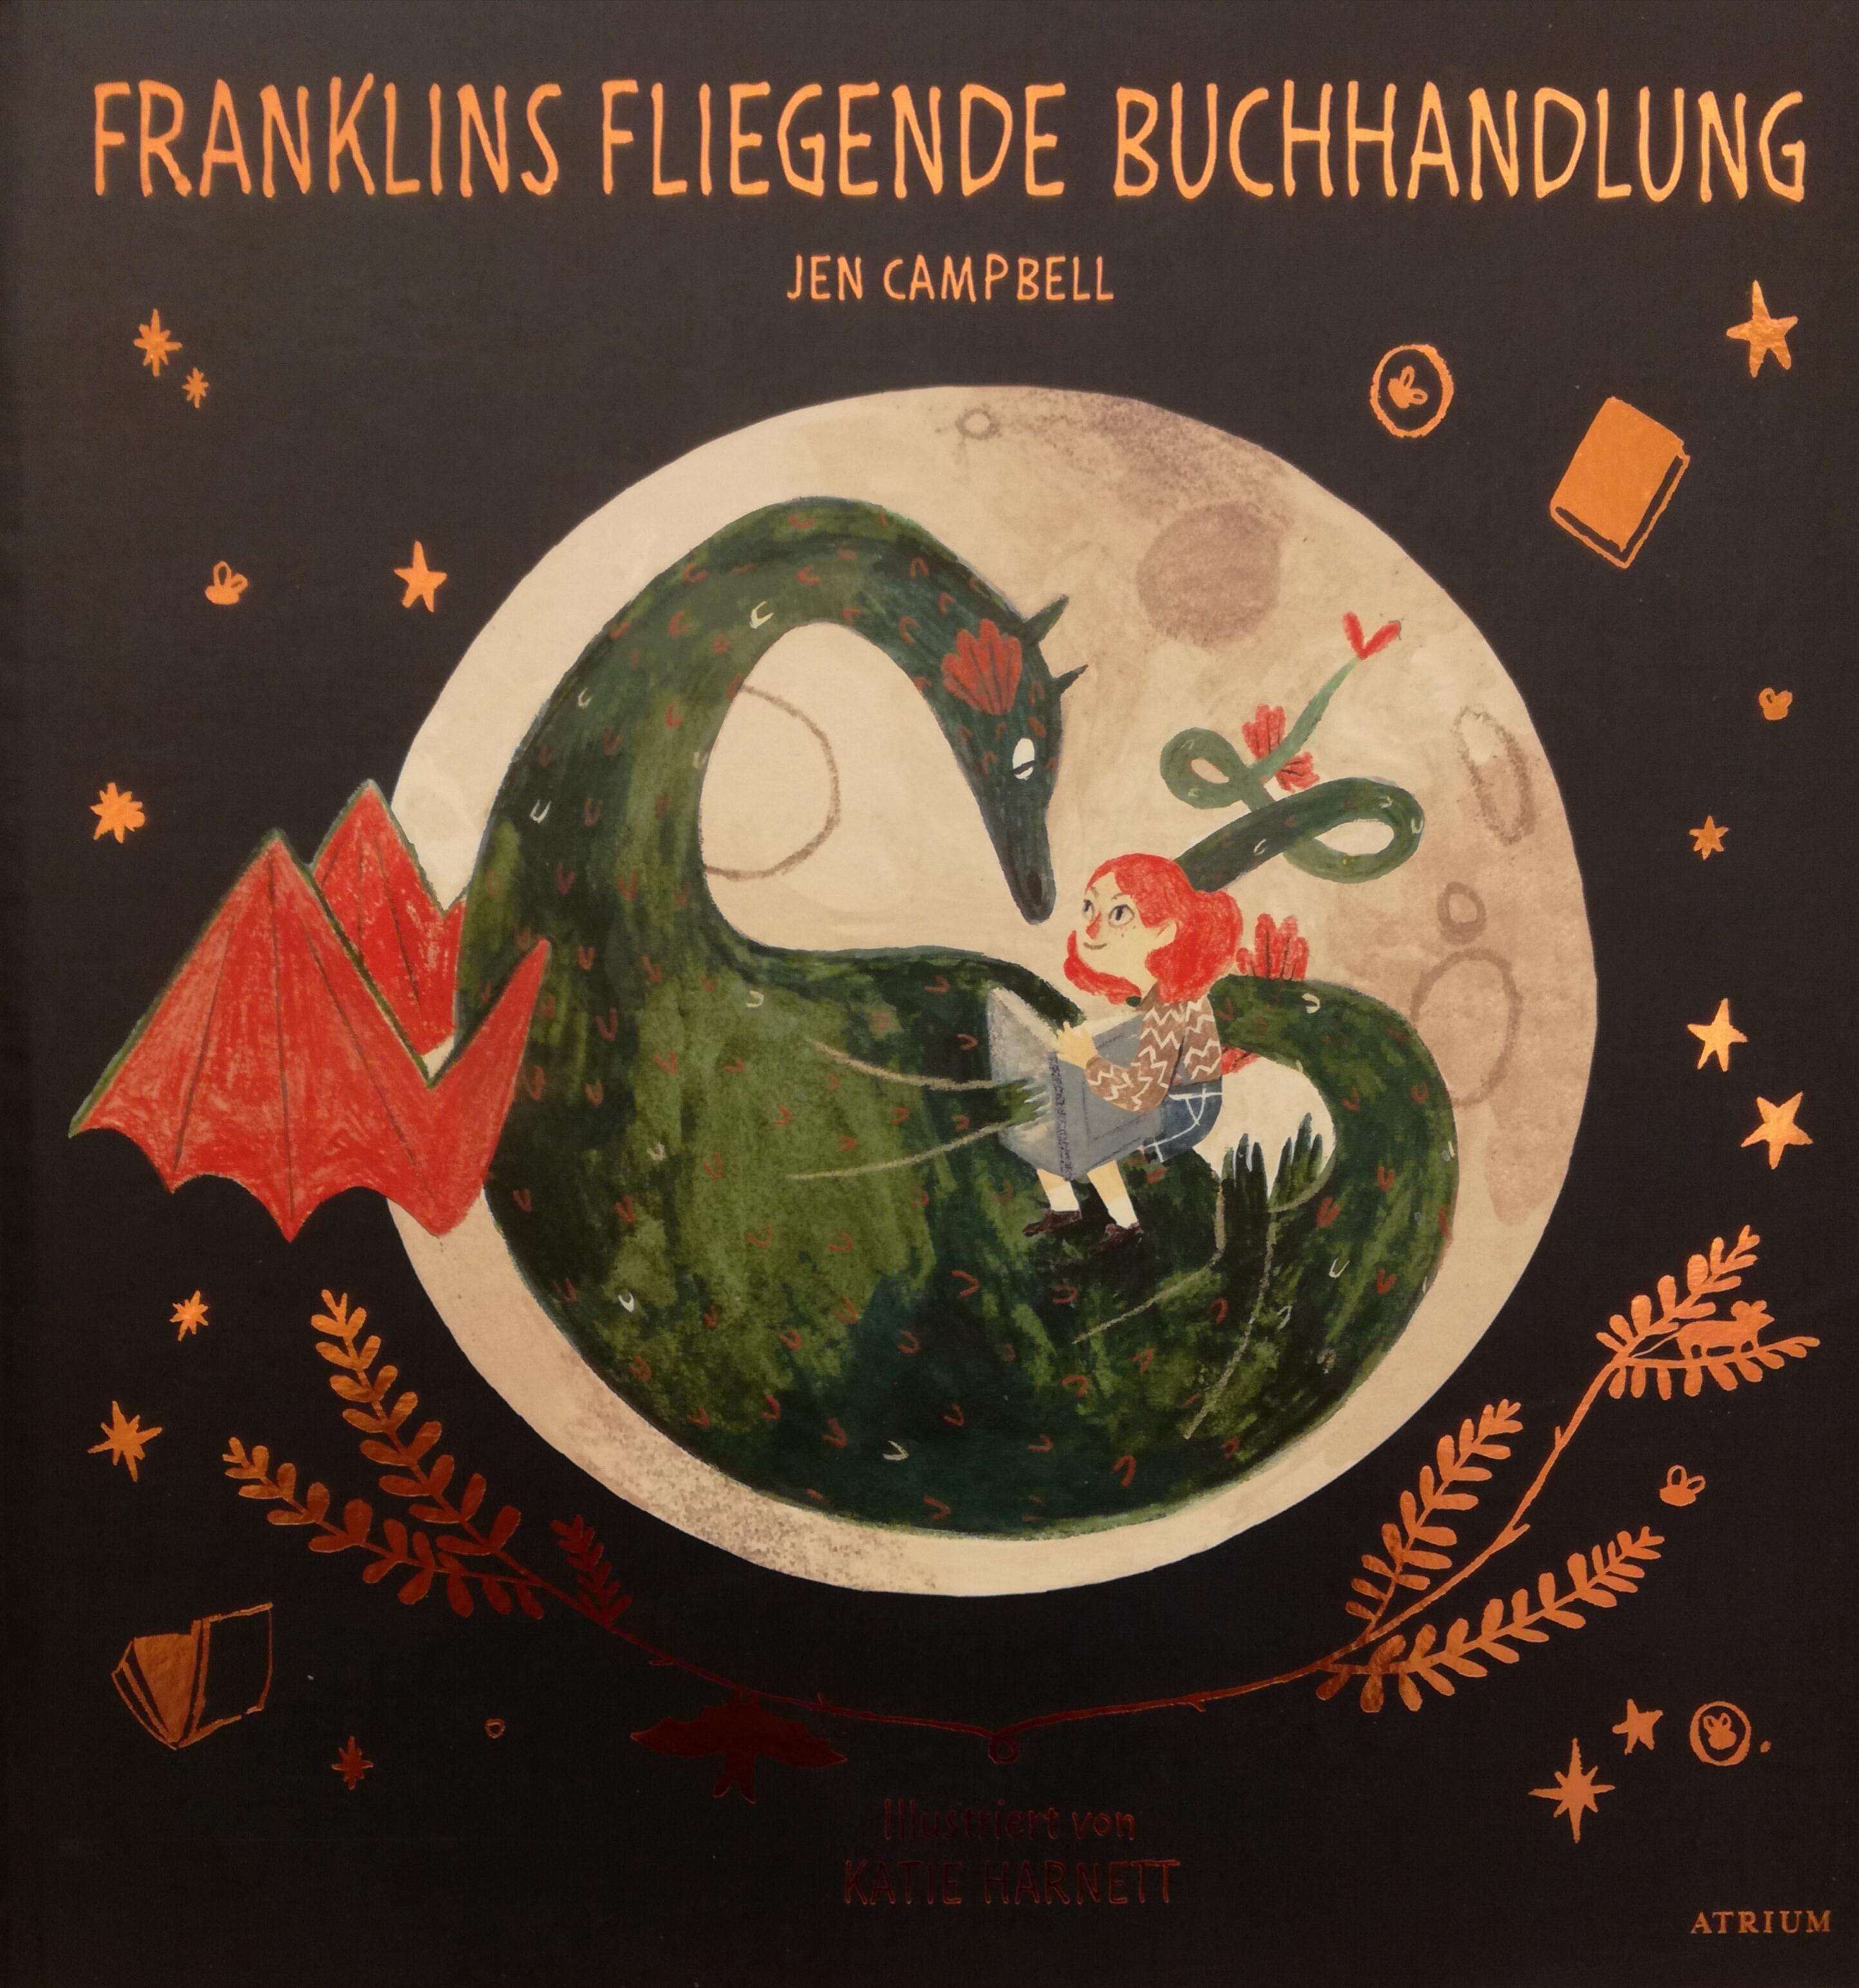 Franklins fliegende Buchhandlung Book Cover